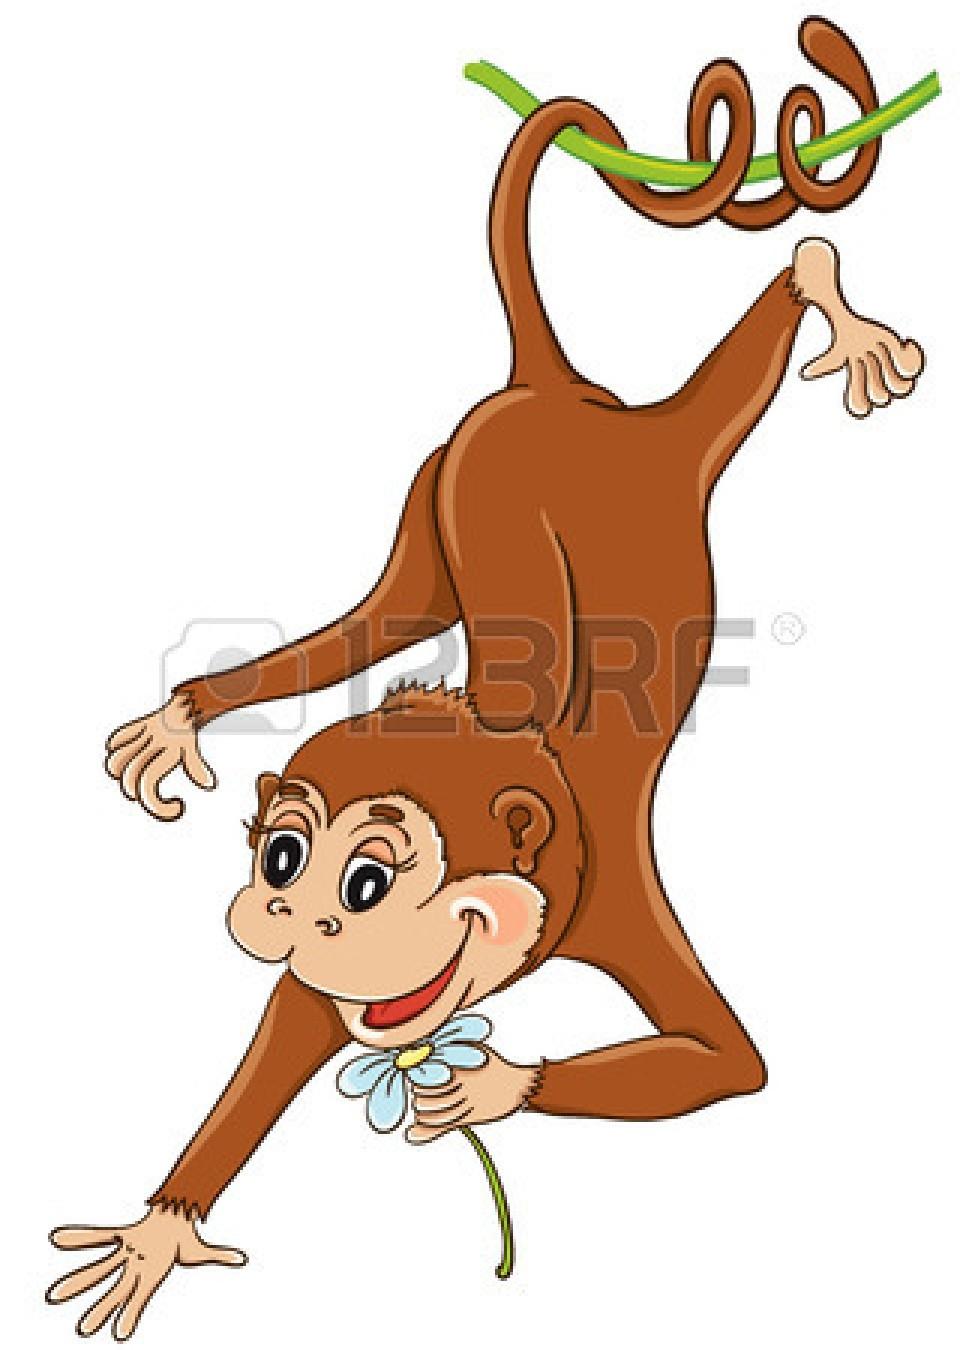 Monkey upside down. Hanging clipart panda free